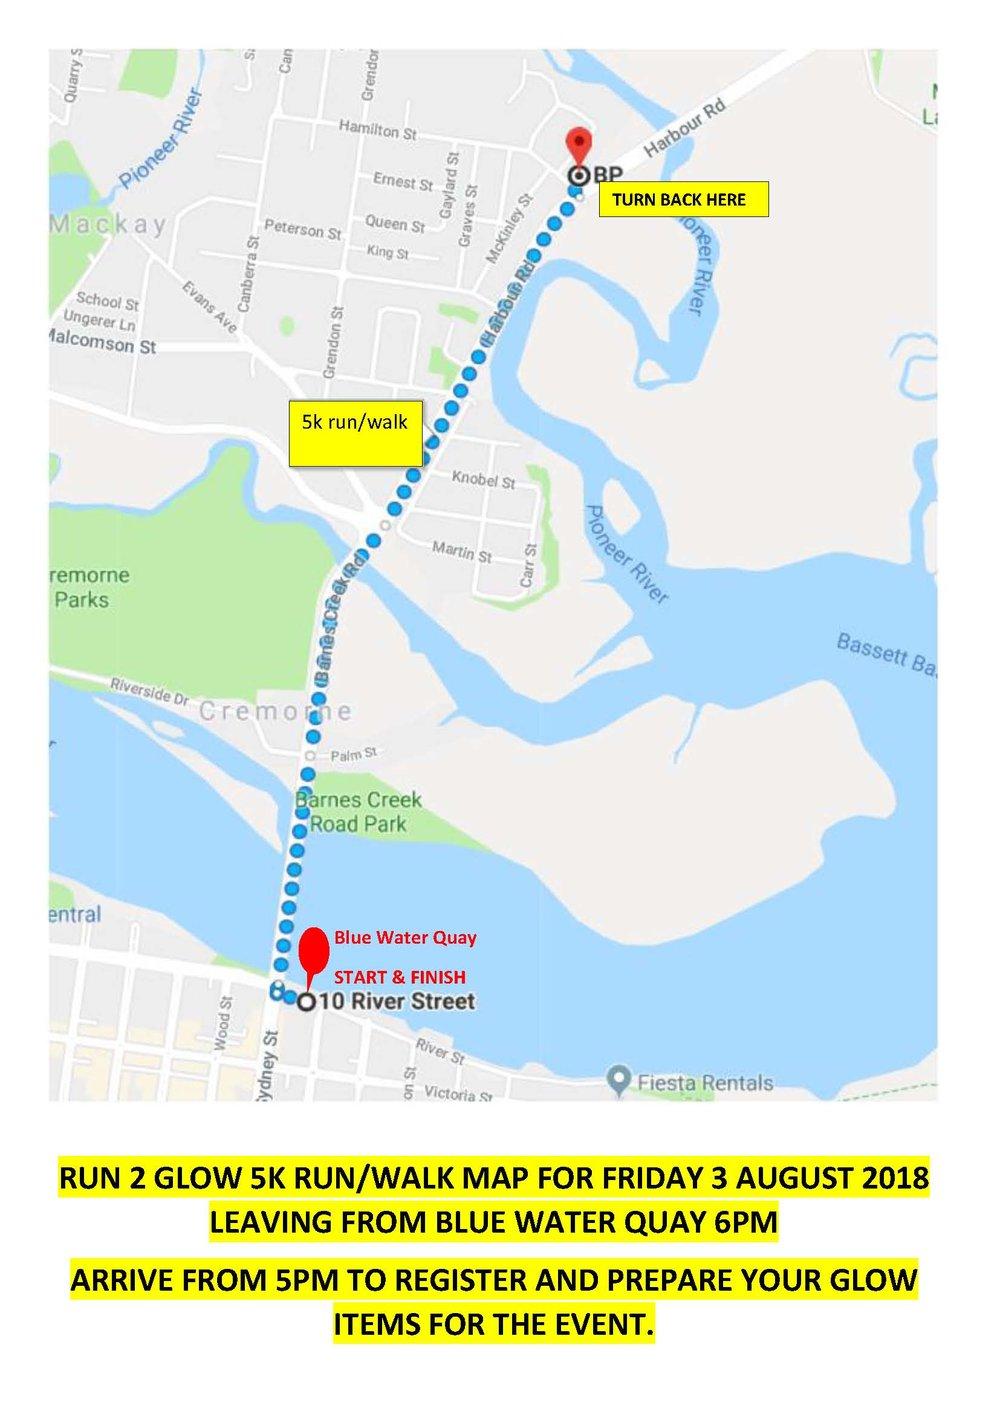 MAP RUN 2 GLOW 5K RUN.jpg